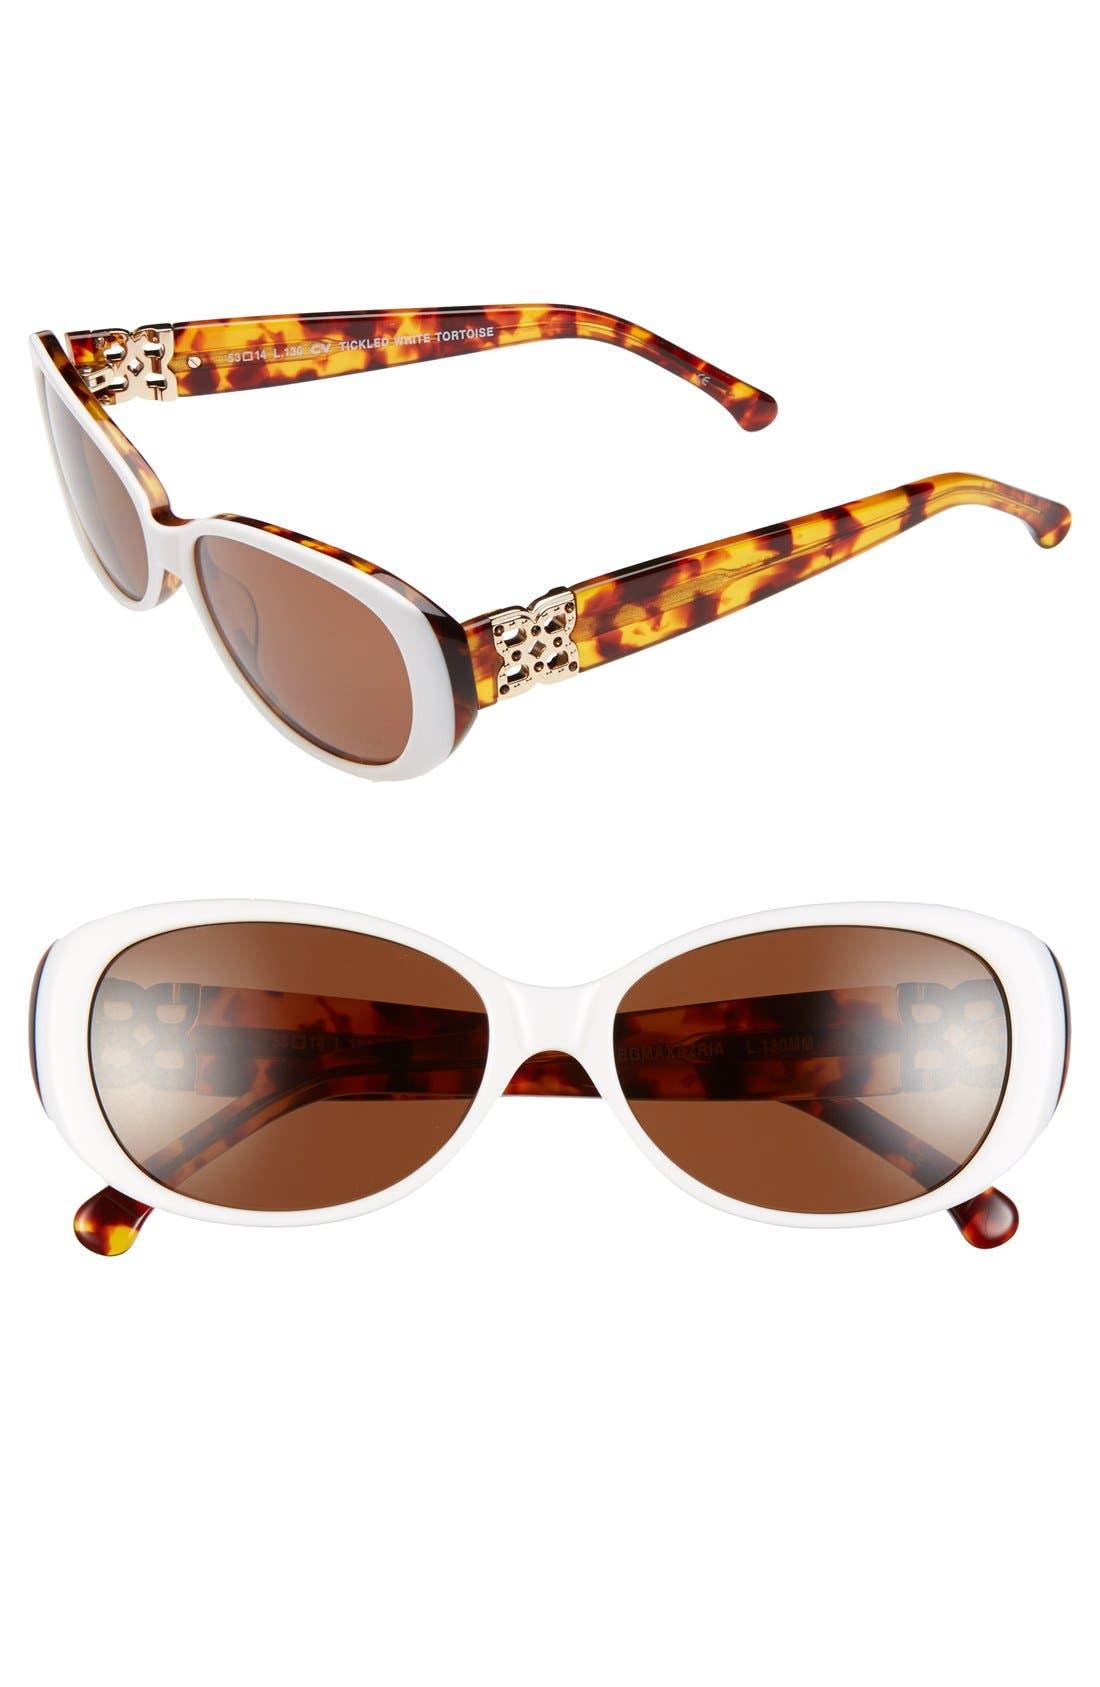 Alternate Image 1 Selected - BCBGMAXAZRIA 'Tickled' 53mm Sunglasses